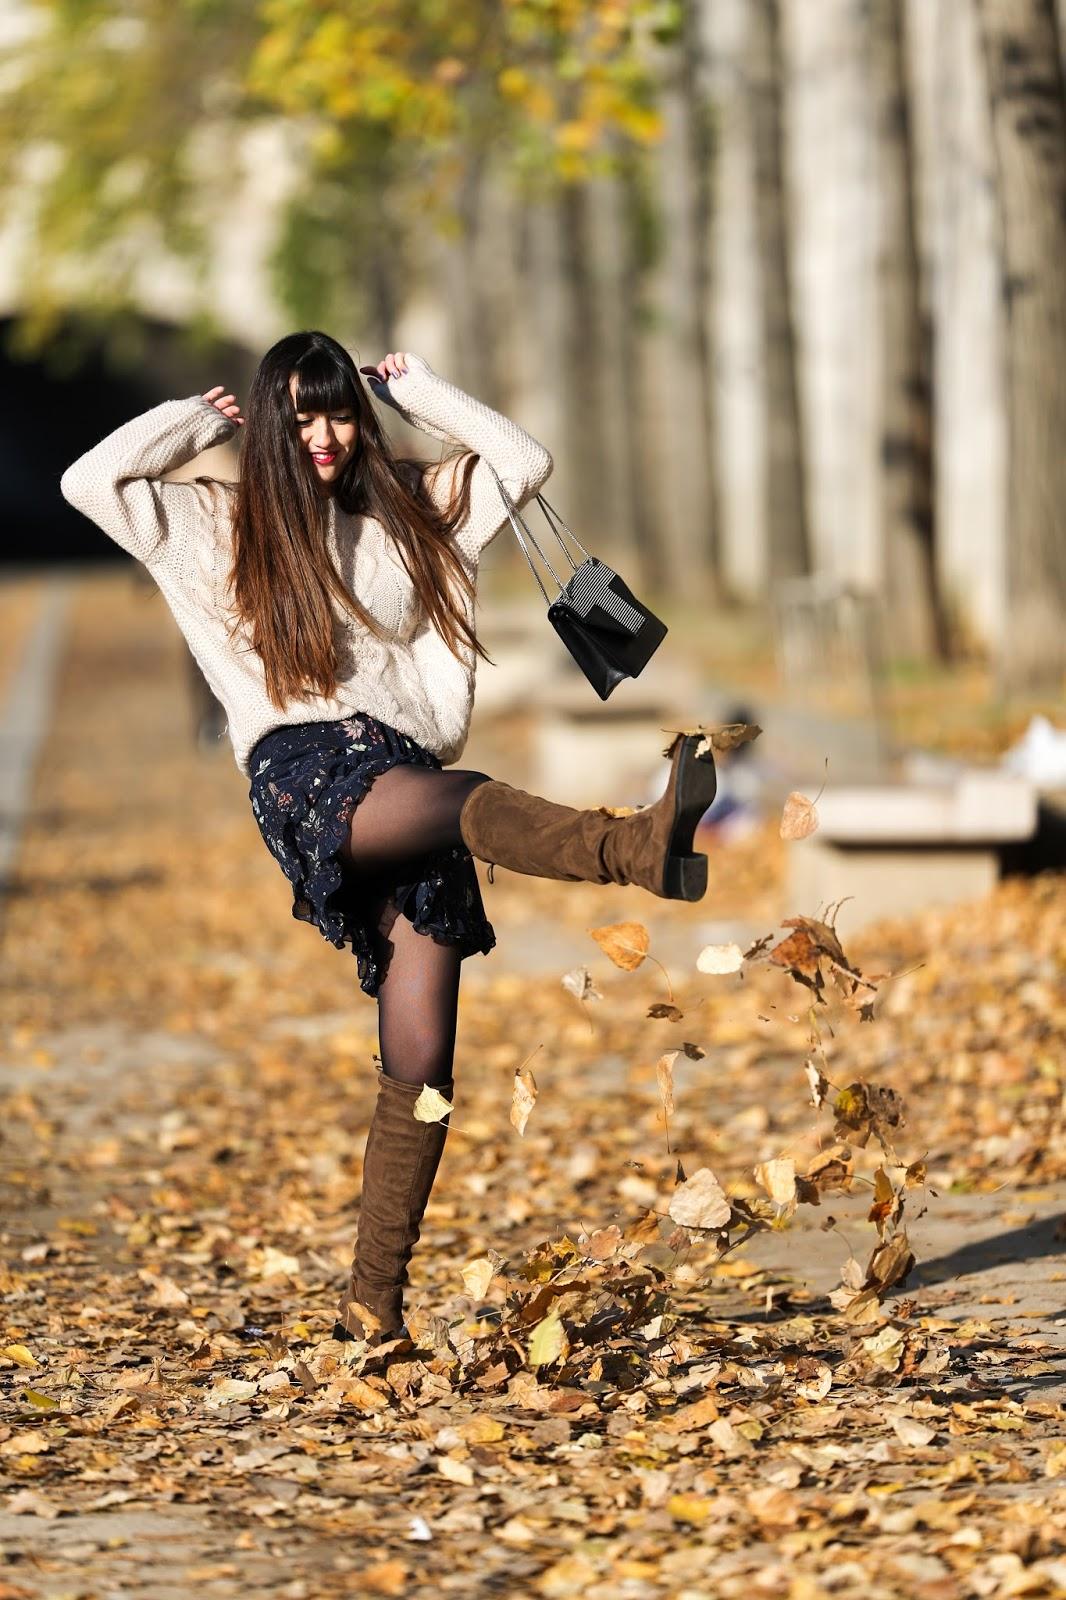 Parisian fashion blogger, look, style, meetmeinparee, paris, mode, ootd, street style, winter style